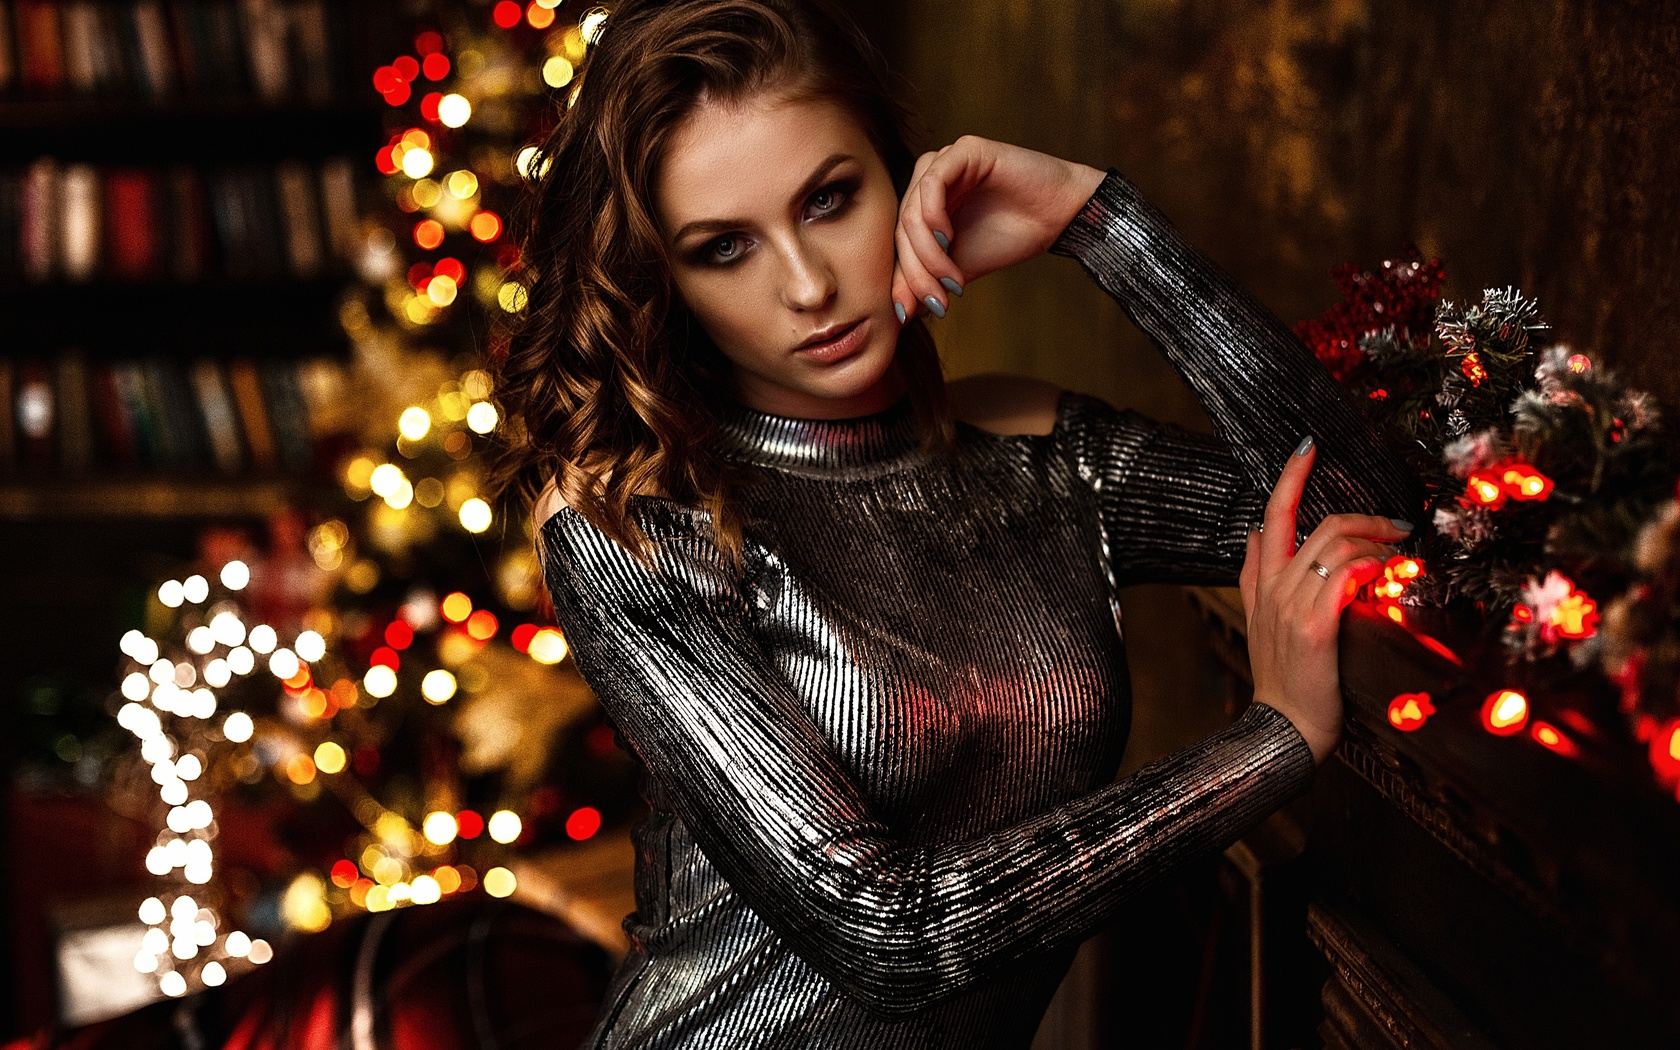 vlad popov, девушка, шатенка, платье, новый год